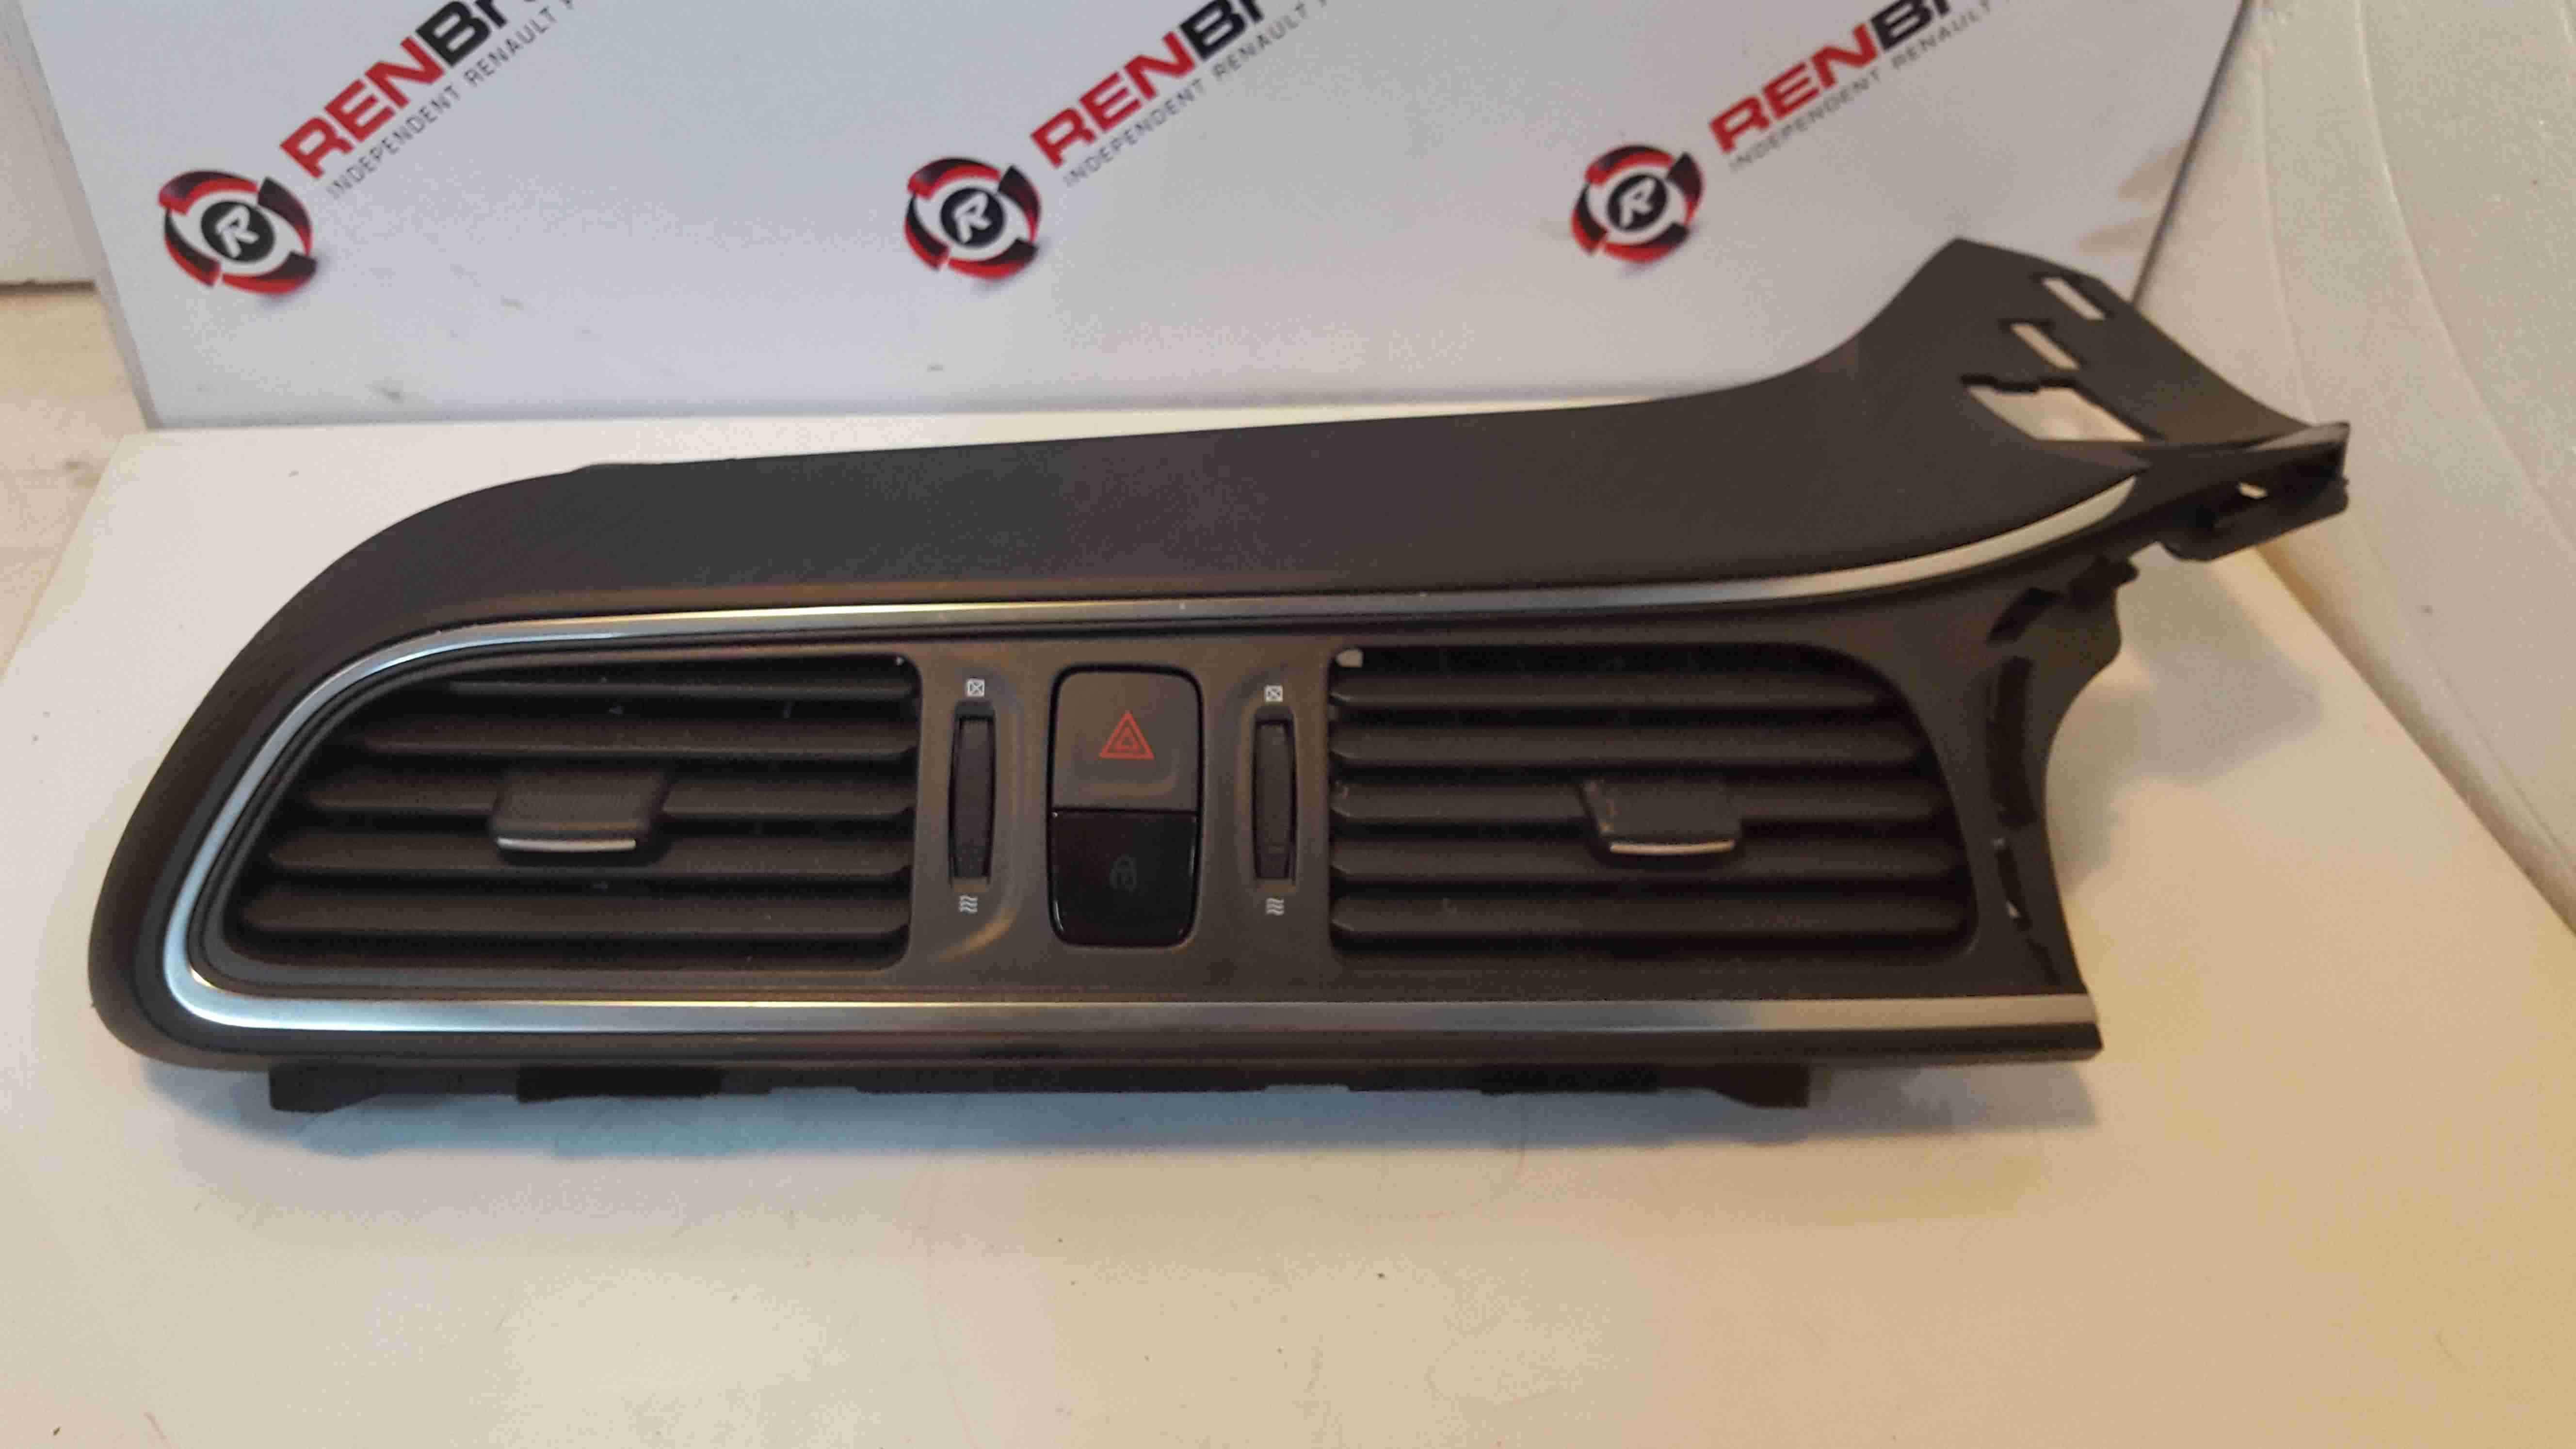 Renault Kadjar 2015-2018 Centre Heater Vents 687502972R